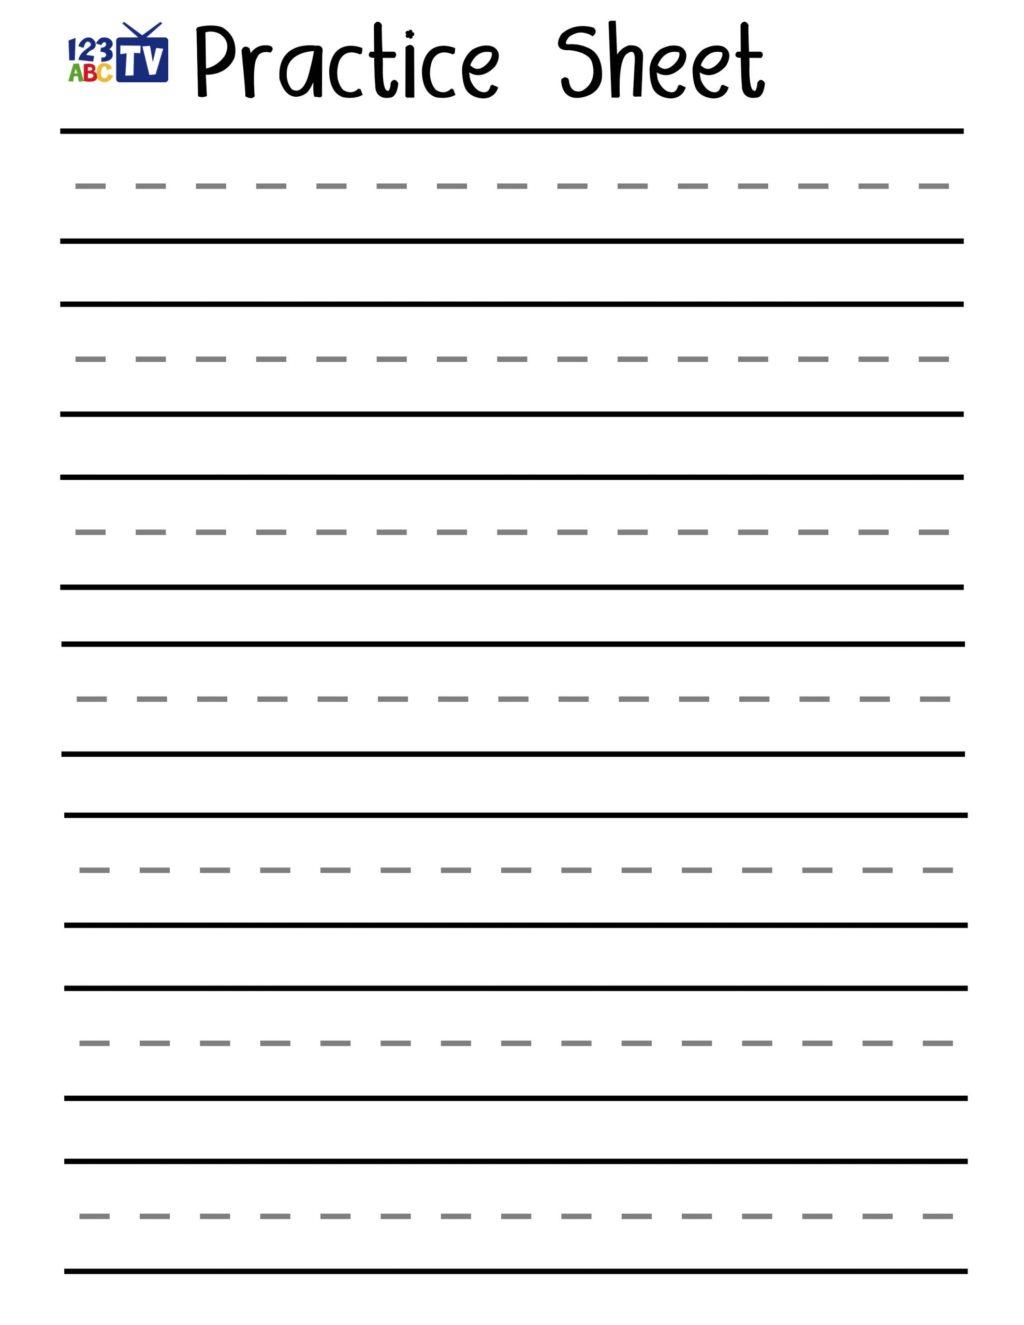 Worksheet ~ Blank Pageactice Handwriting Letter Downloads Tv